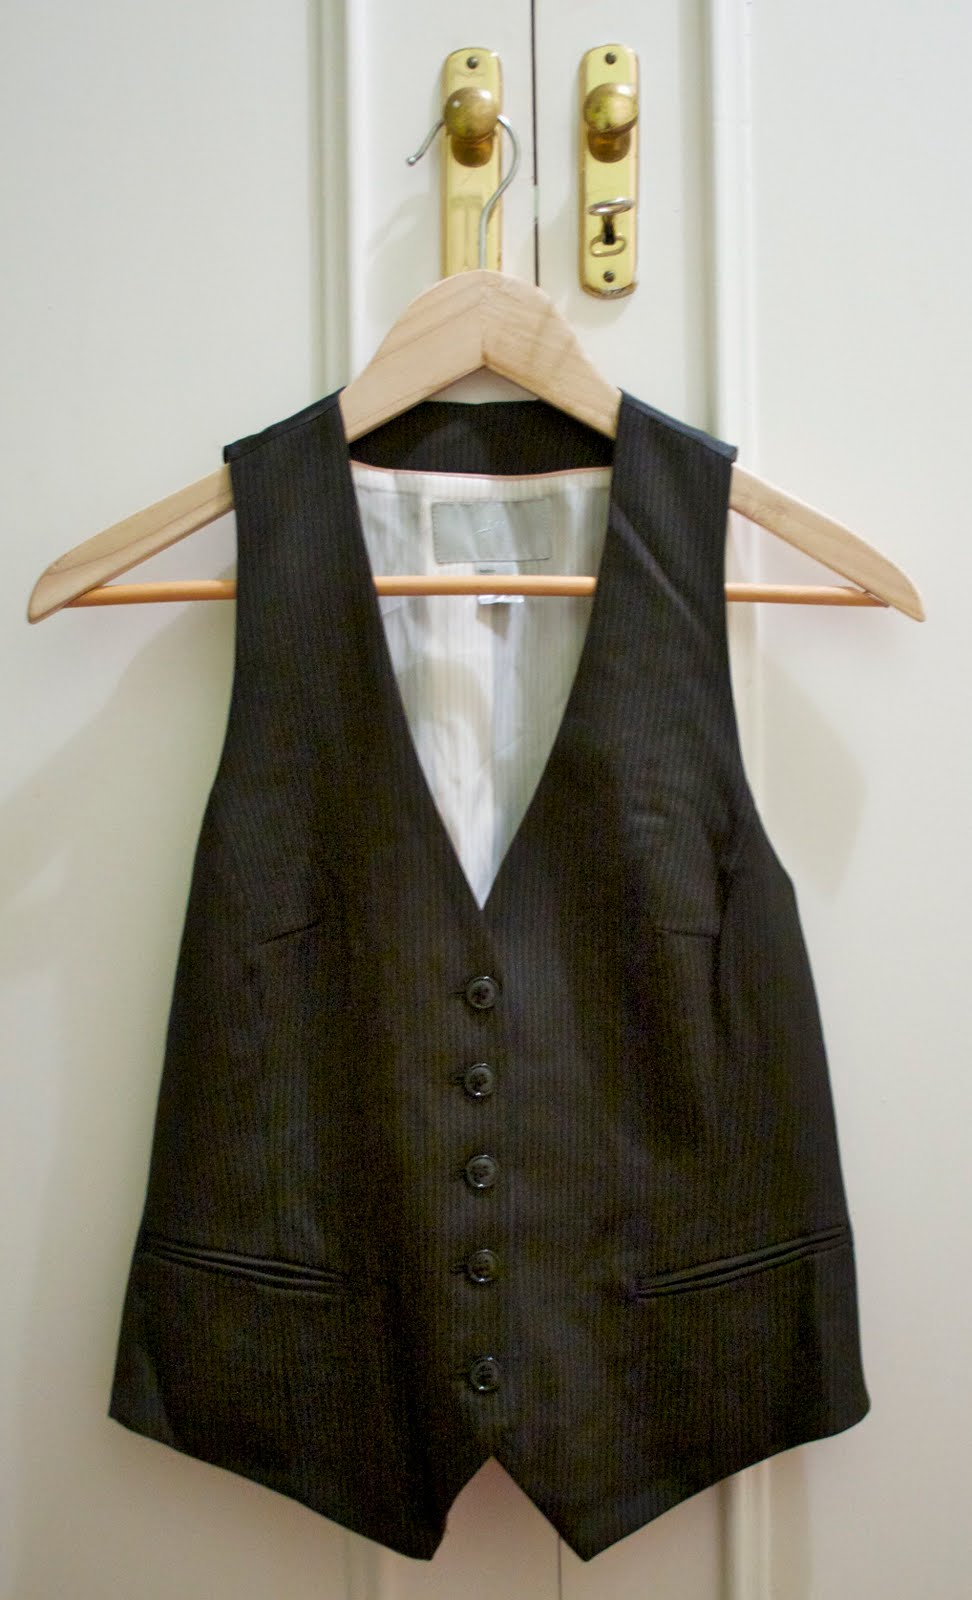 Cómo customizar un chaleco de H&M-70-crimenesdelamoda